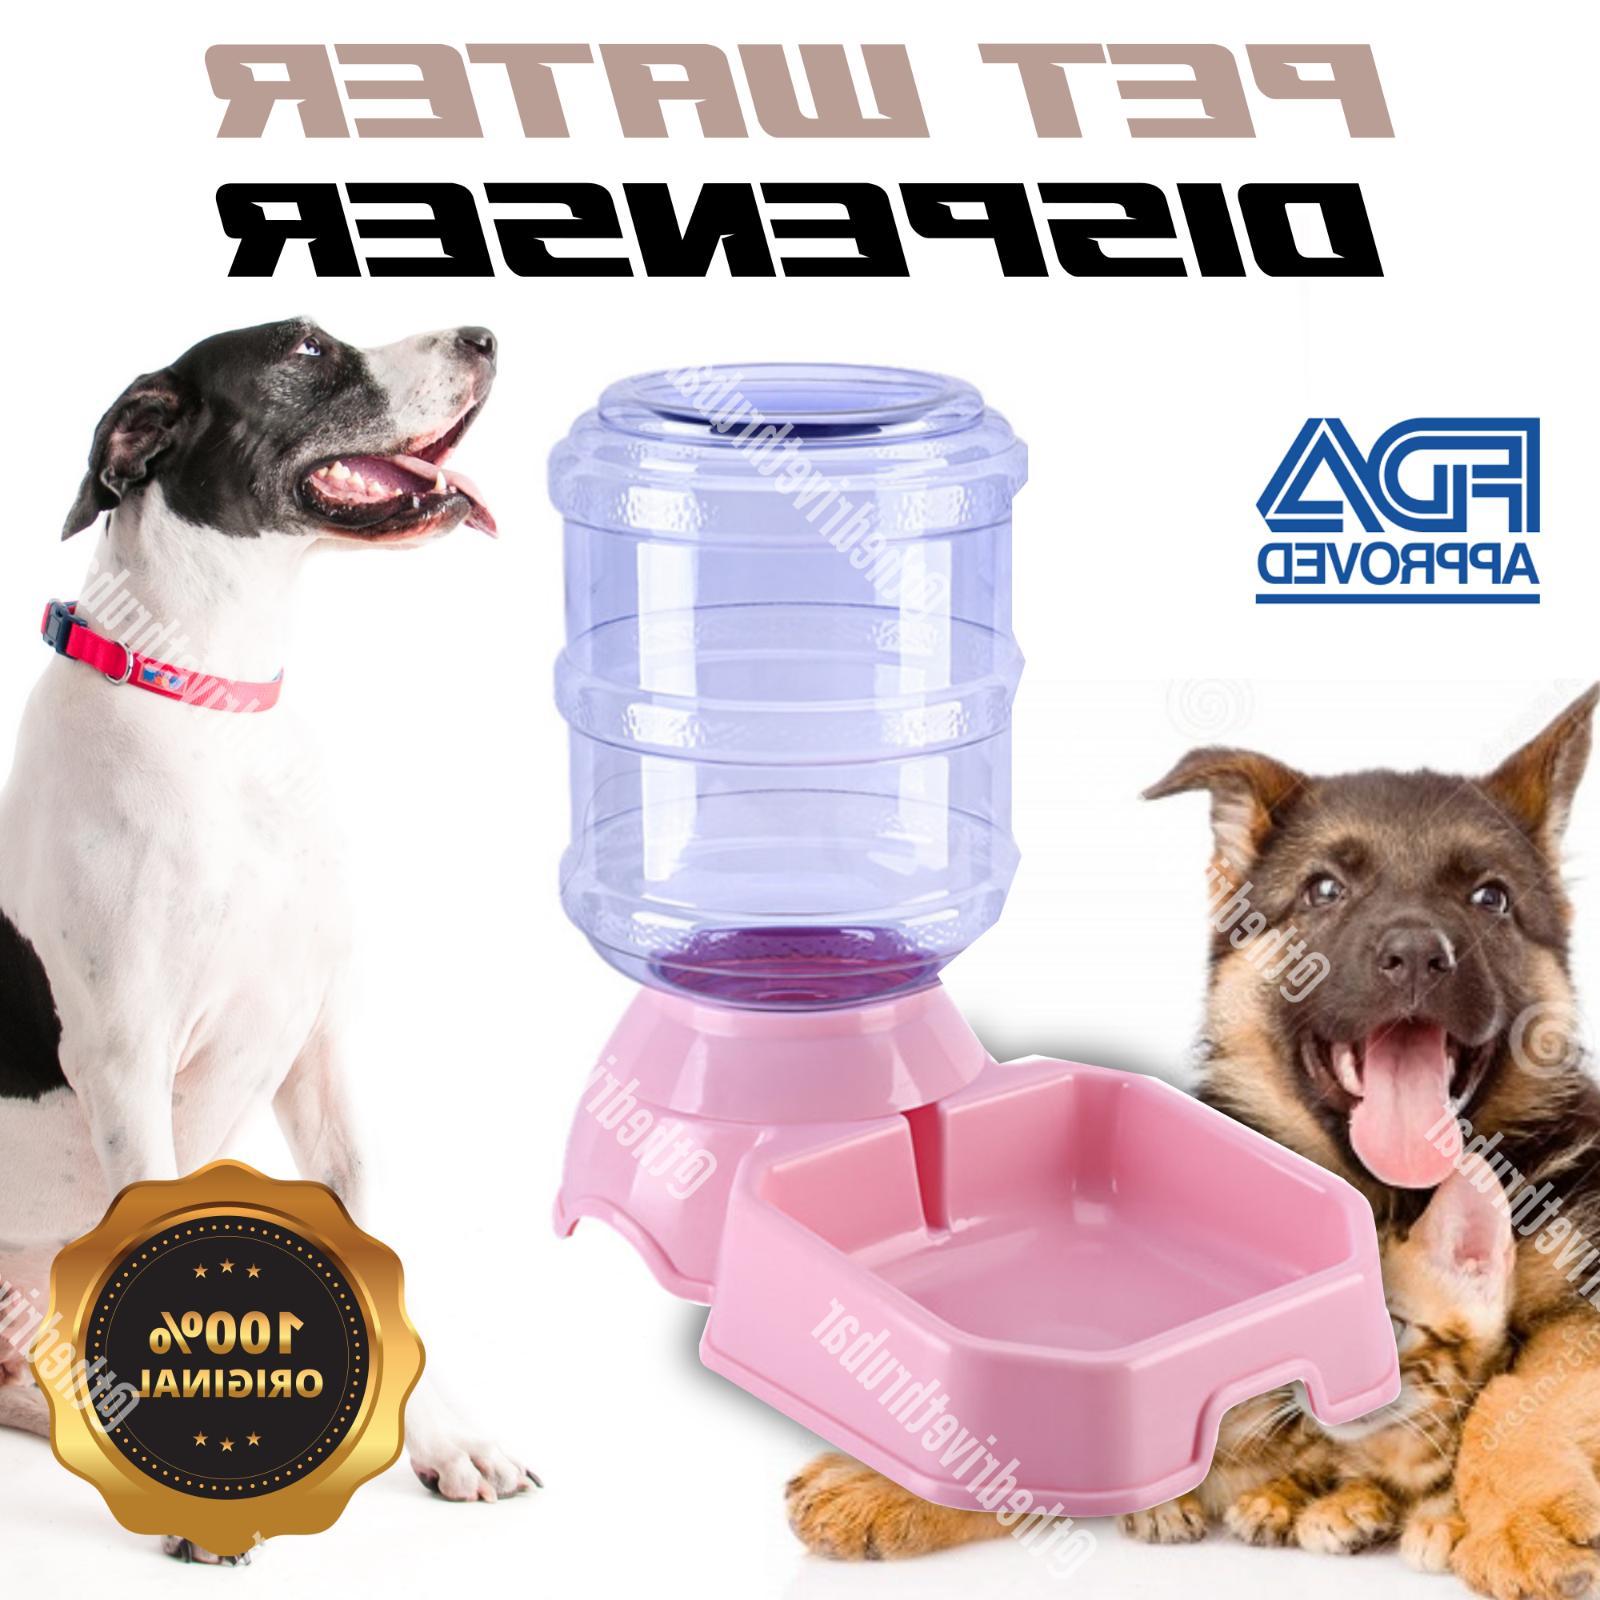 AUTOMATIC WATER Feeder Feeding Cat